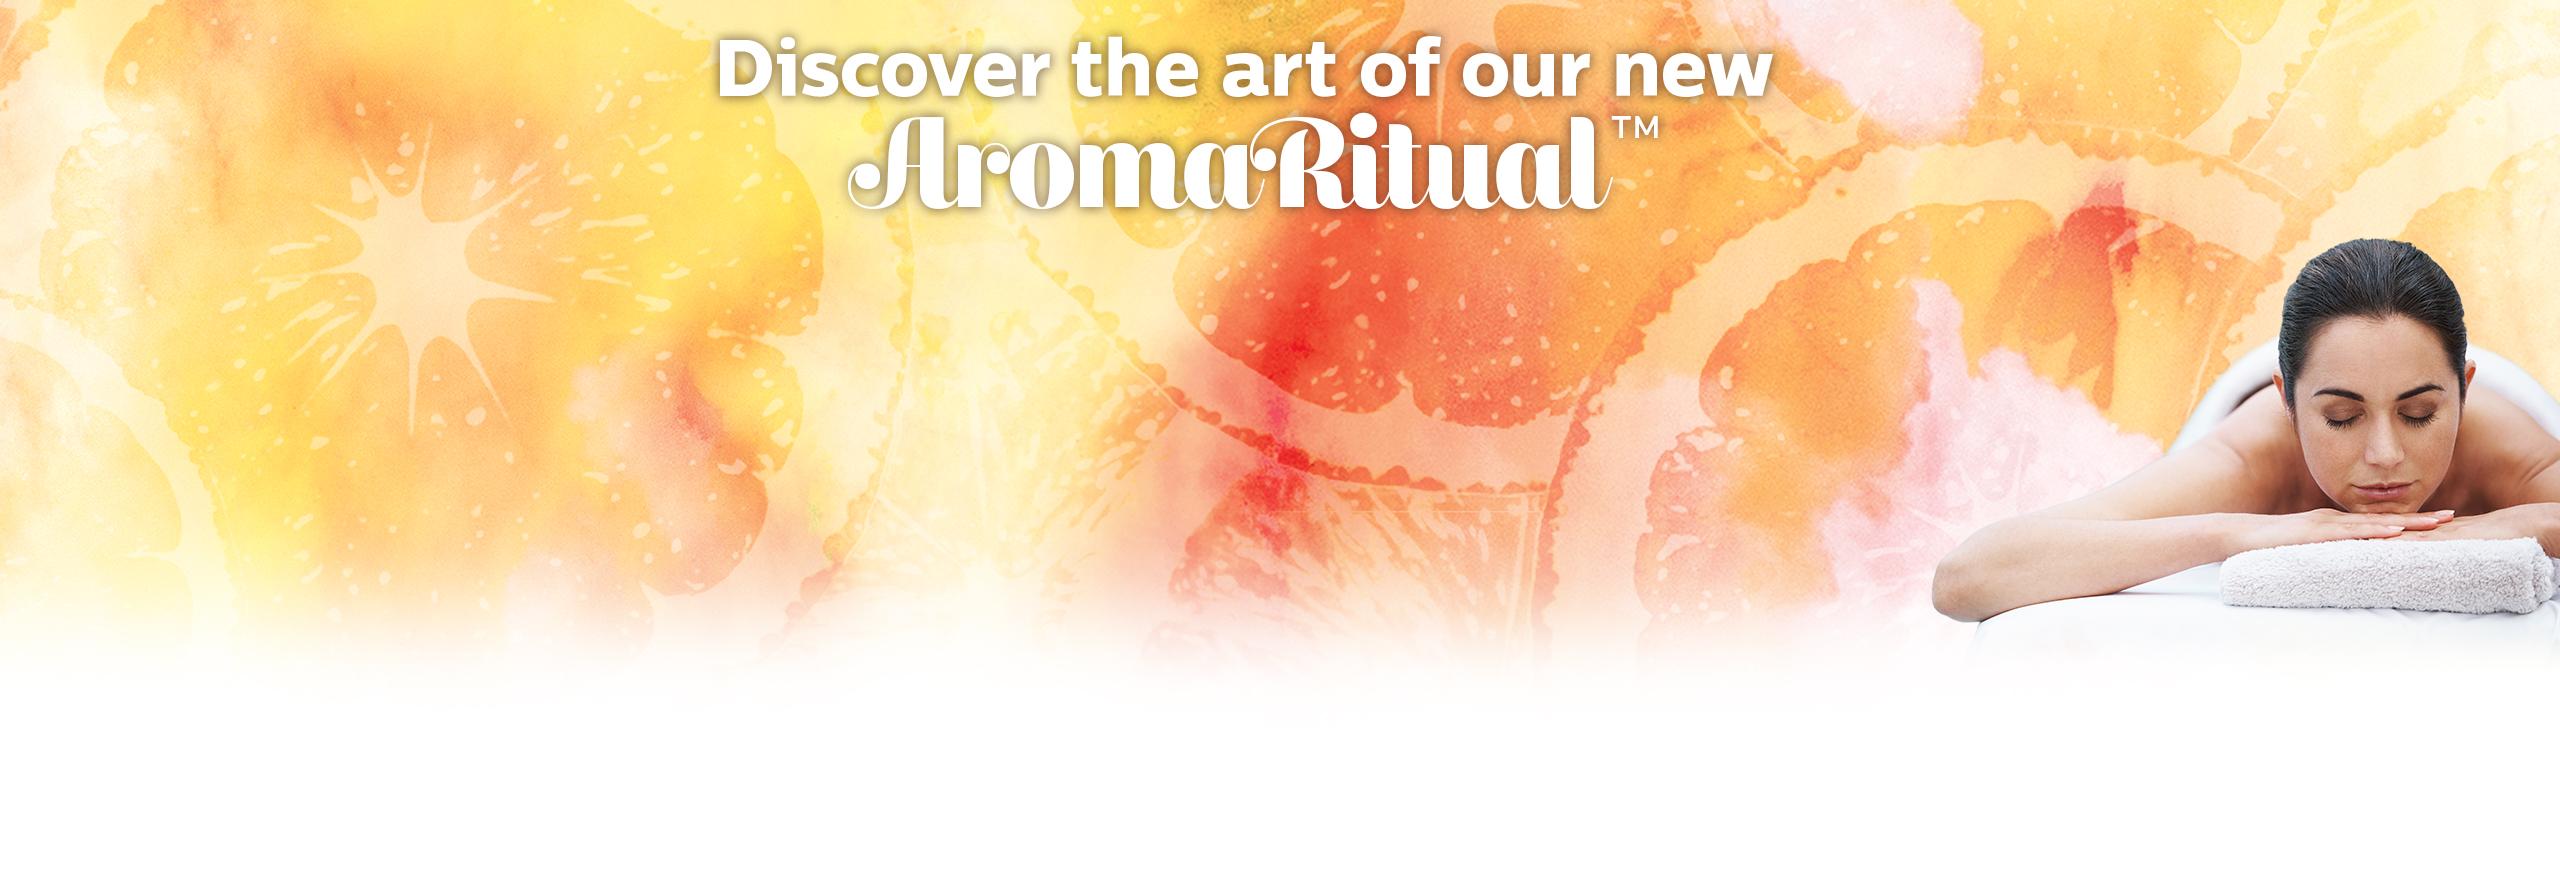 Aromaritual Corp Homepage